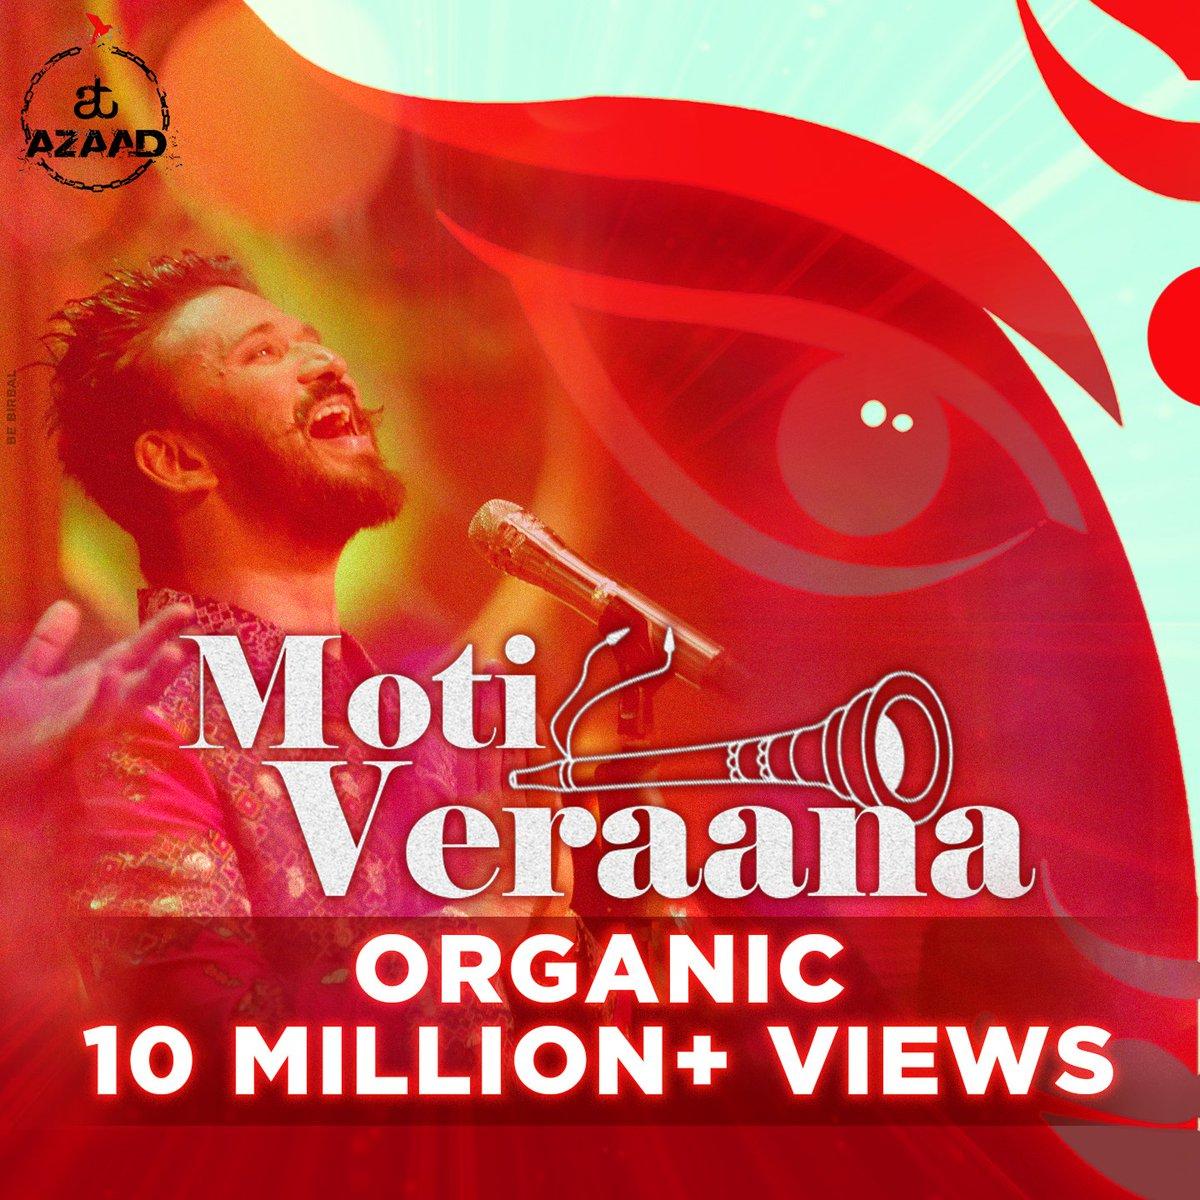 10 Million+ Views!  Moti Veraana - the first song from the first project of AT Azaad has just hit that mark organically.  To see this happen during #Navratri is pure joy.  Did you Garba on Moti Veraana?  #MotiVeraana #SongsofFaith #Garba #AmitTrivedi #AmitTrivediMusic #ATAzaad https://t.co/2aO1lmdn1C